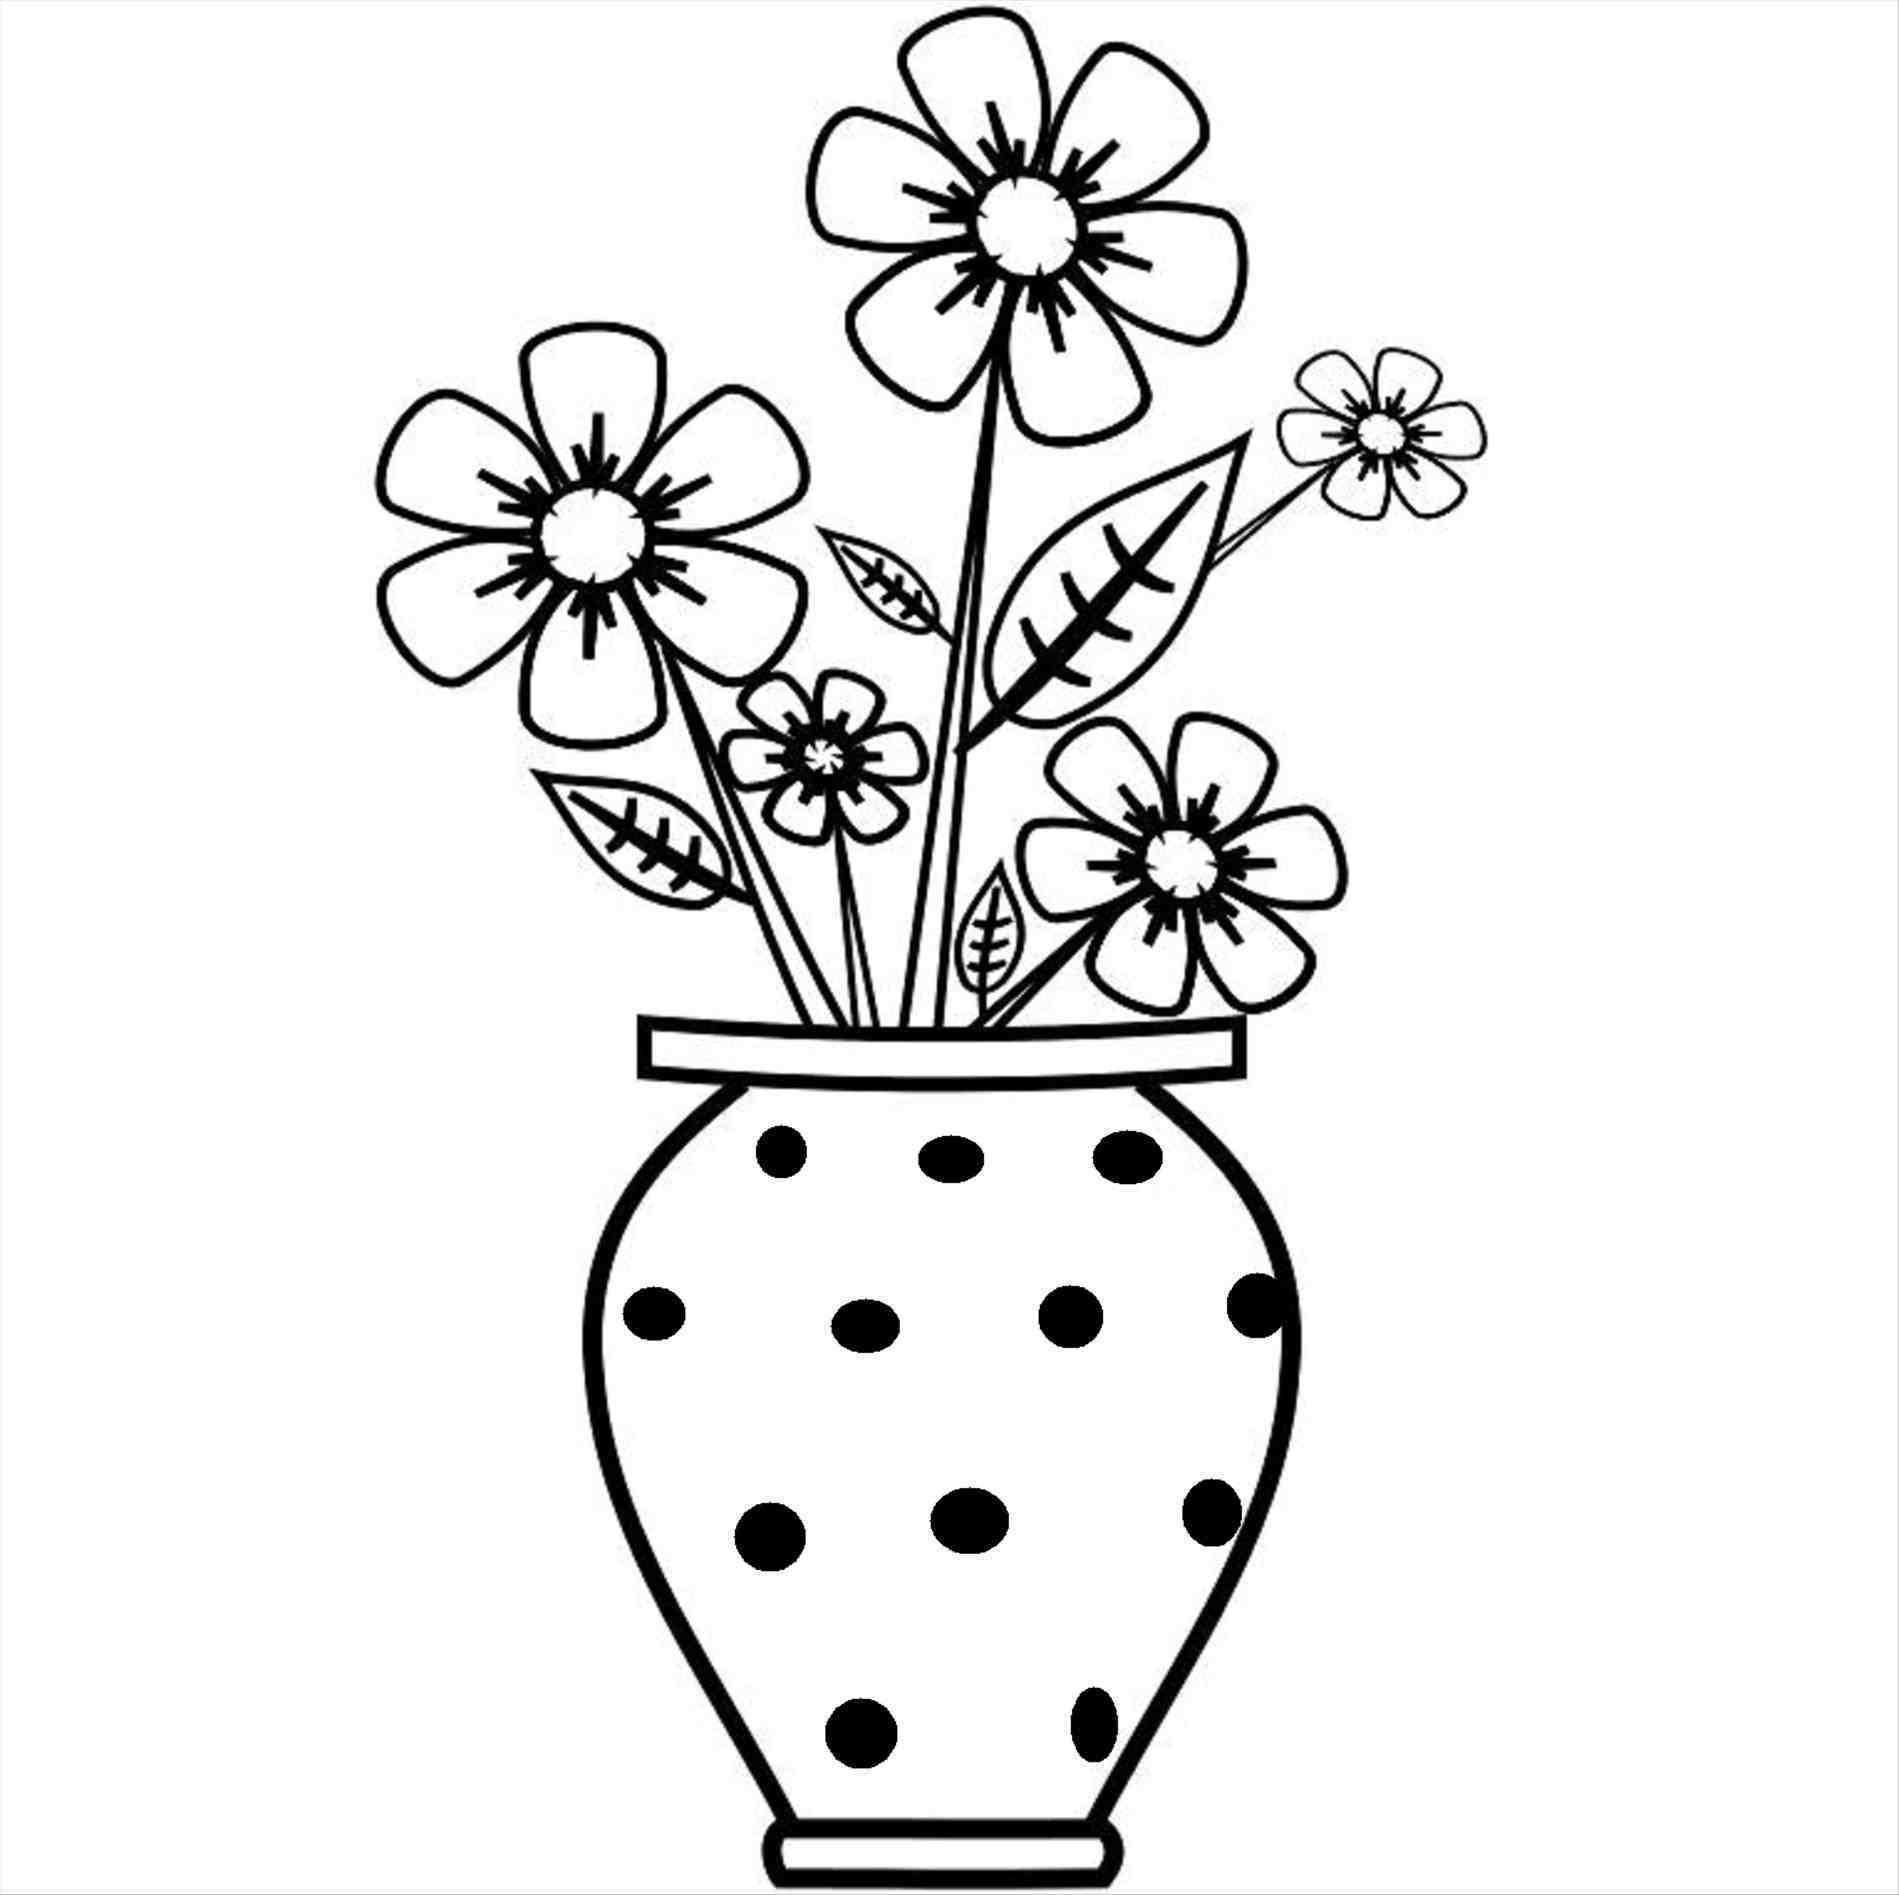 Flower Drawings For Kids